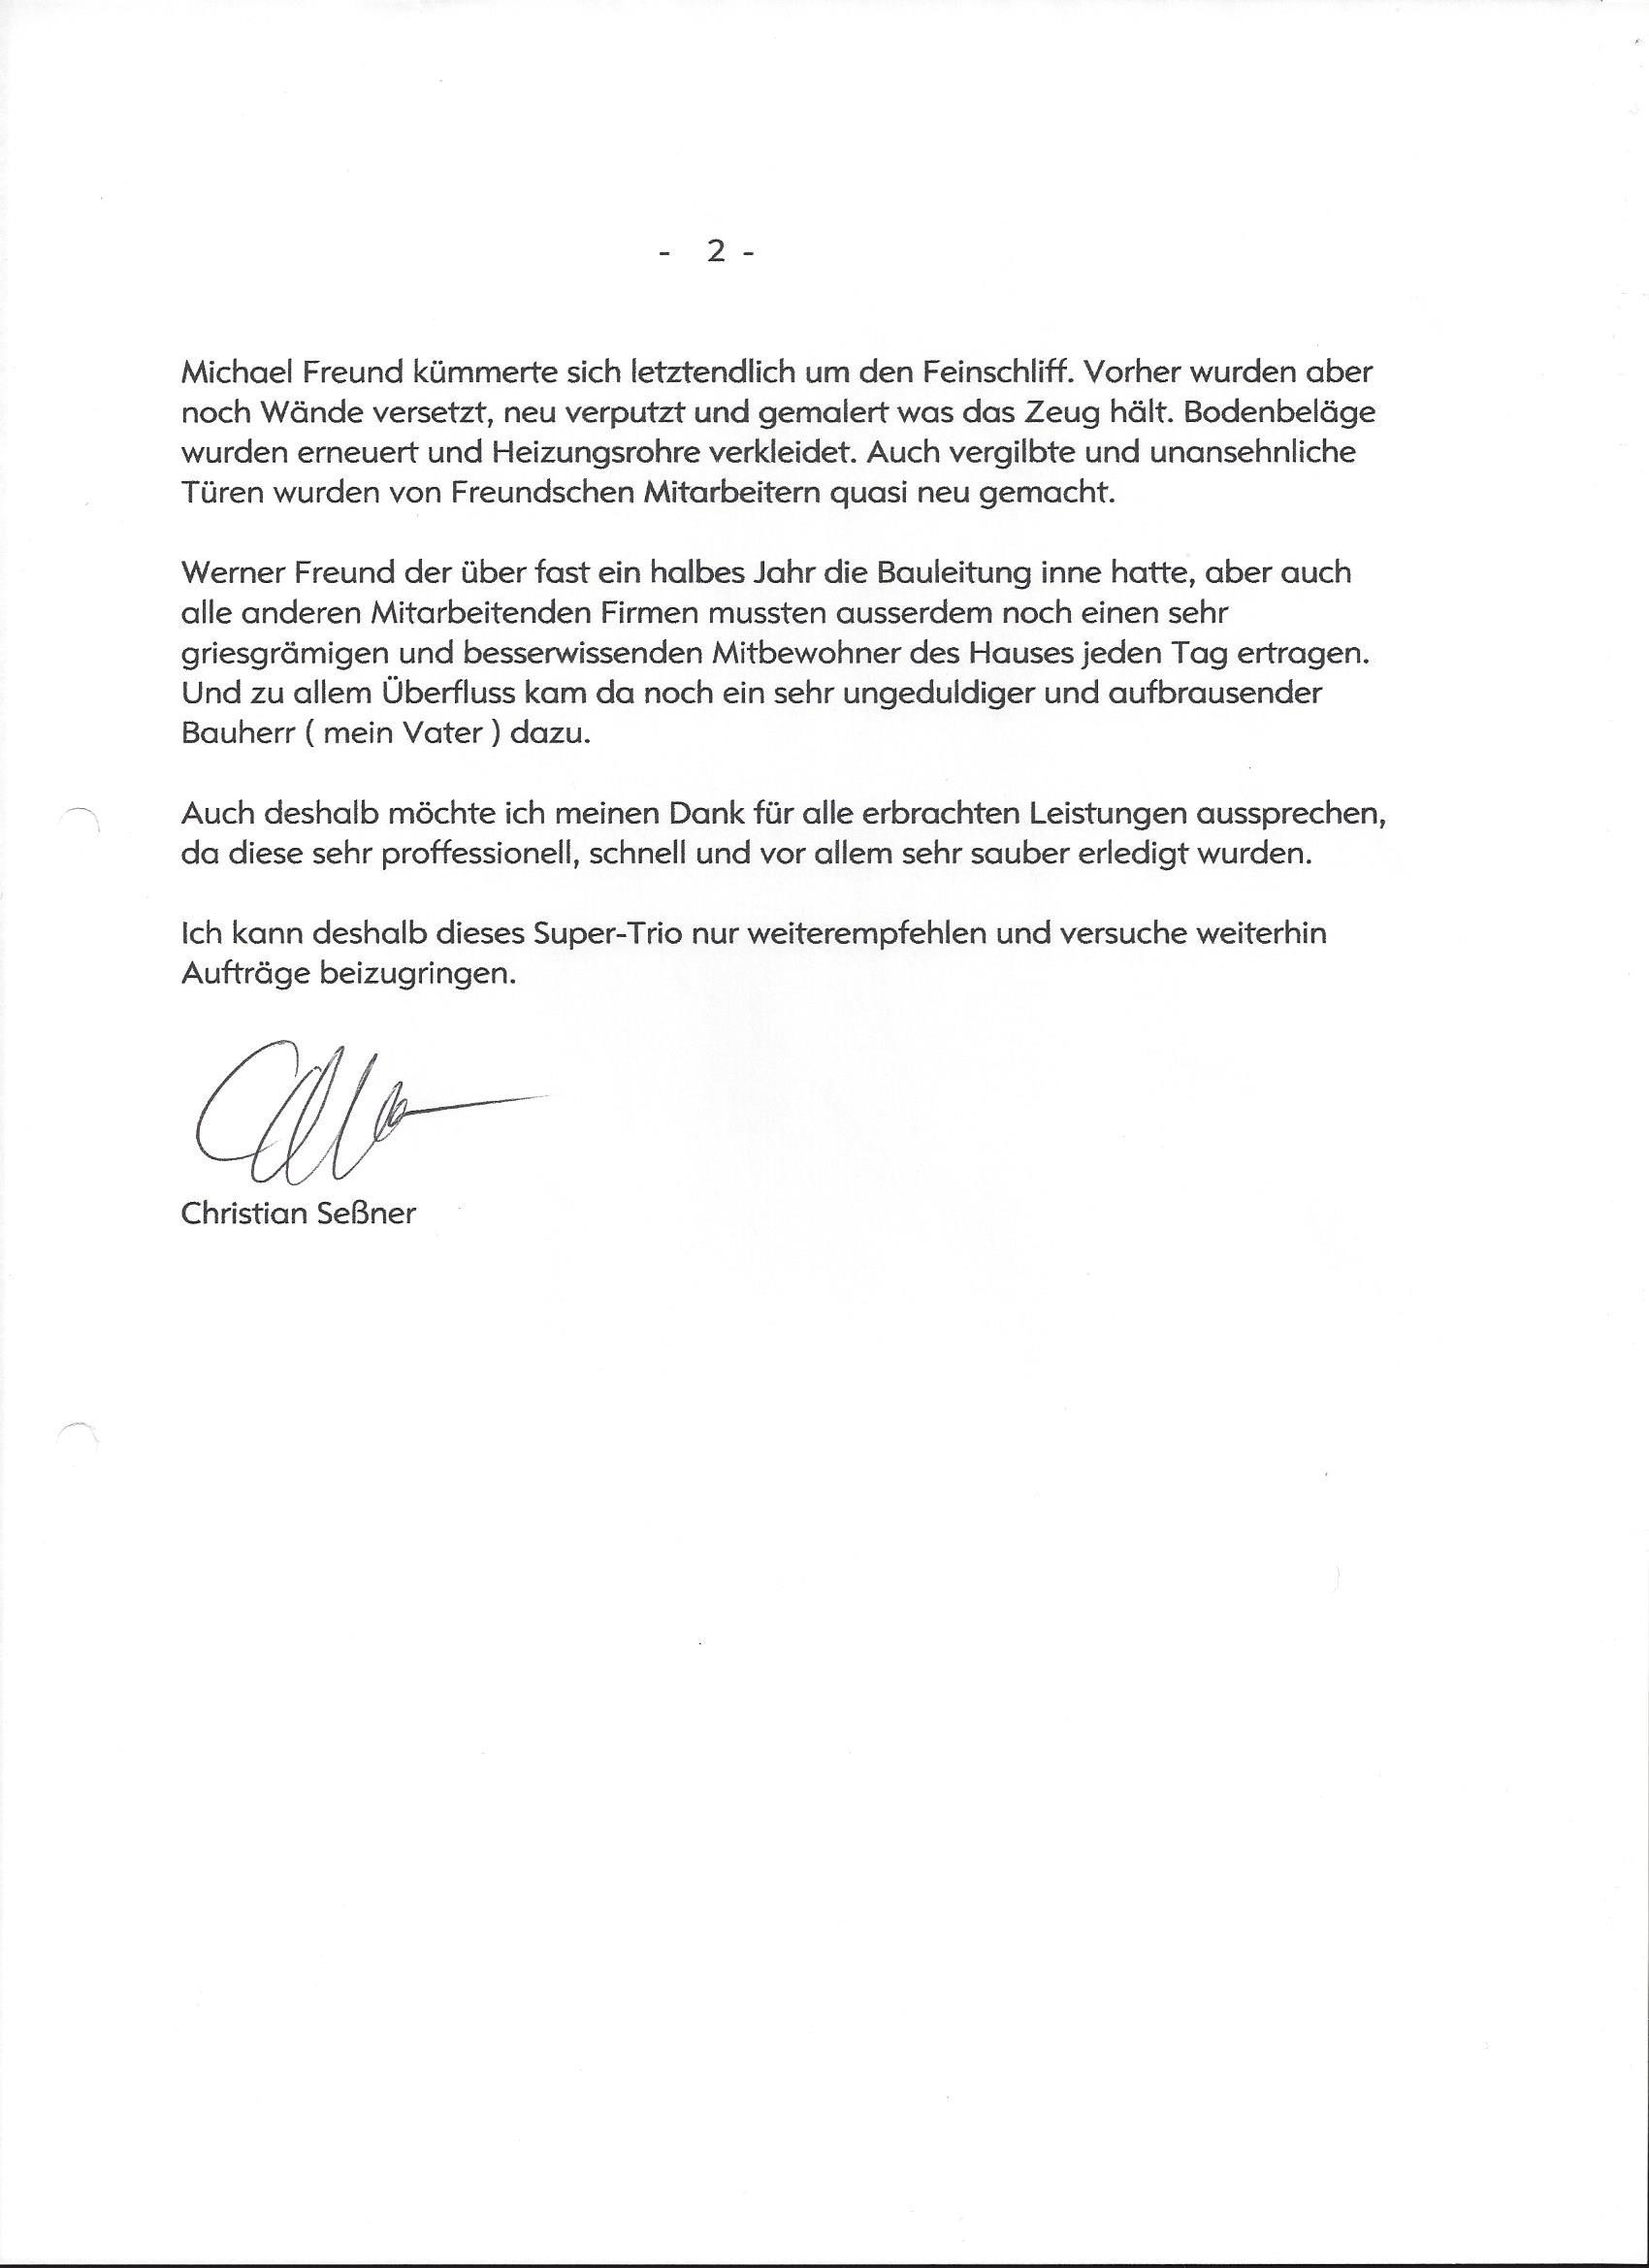 Zeugnis_Opel_Sessner_Seite_2